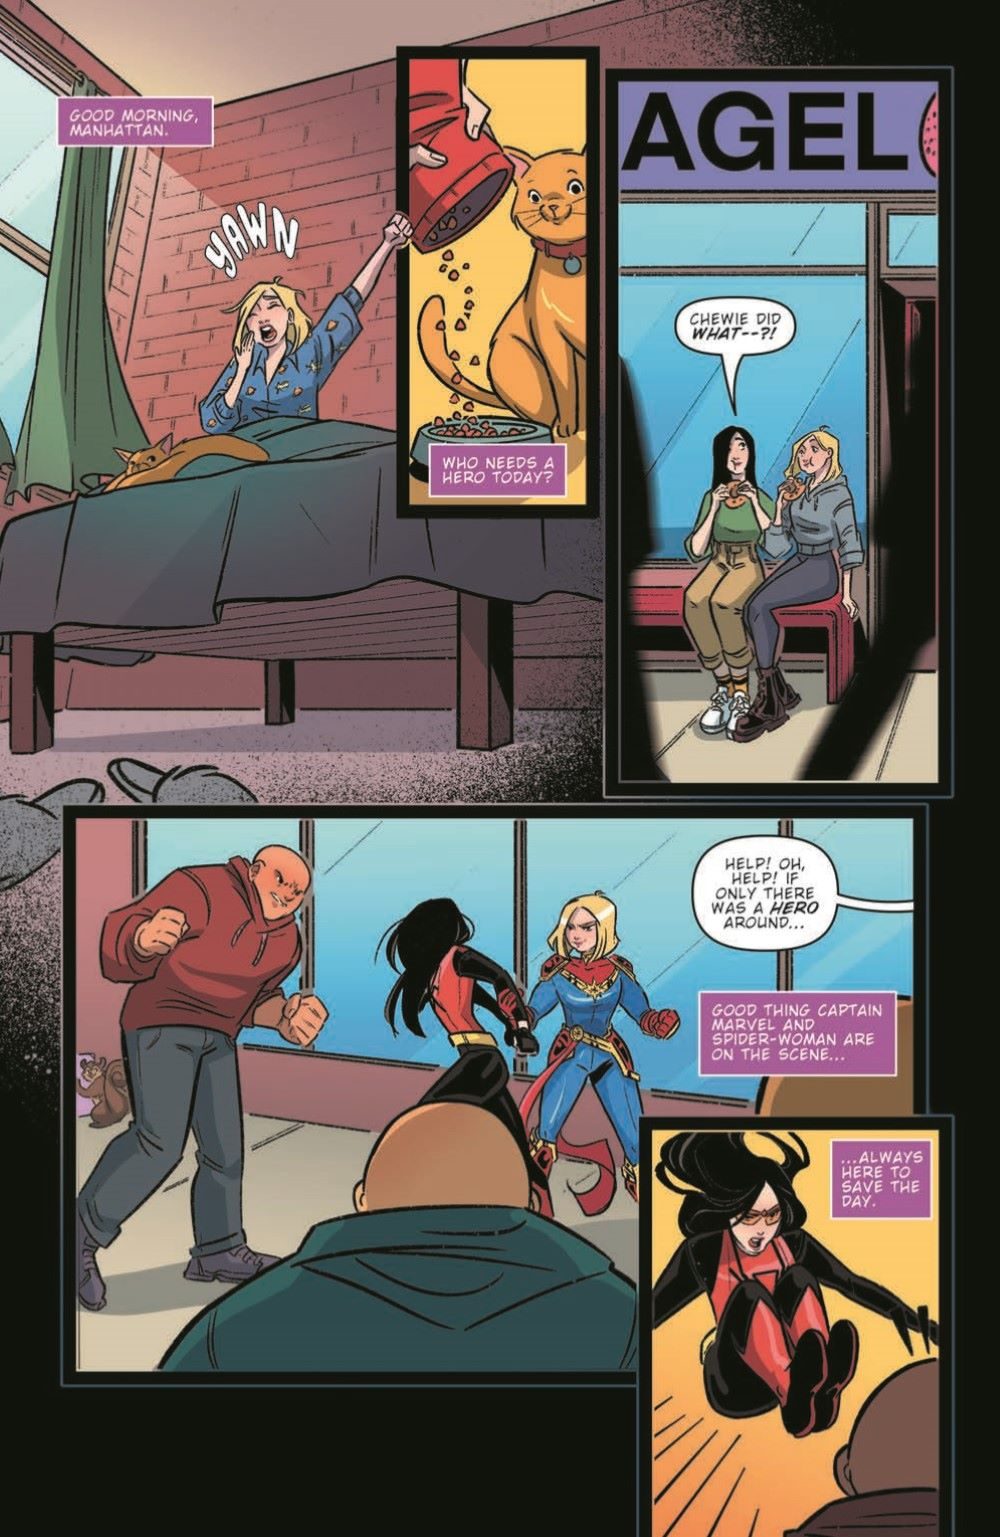 CaptainMarvel2_03_pr-6 ComicList Previews: MARVEL ACTION CAPTAIN MARVEL VOLUME 2 #3